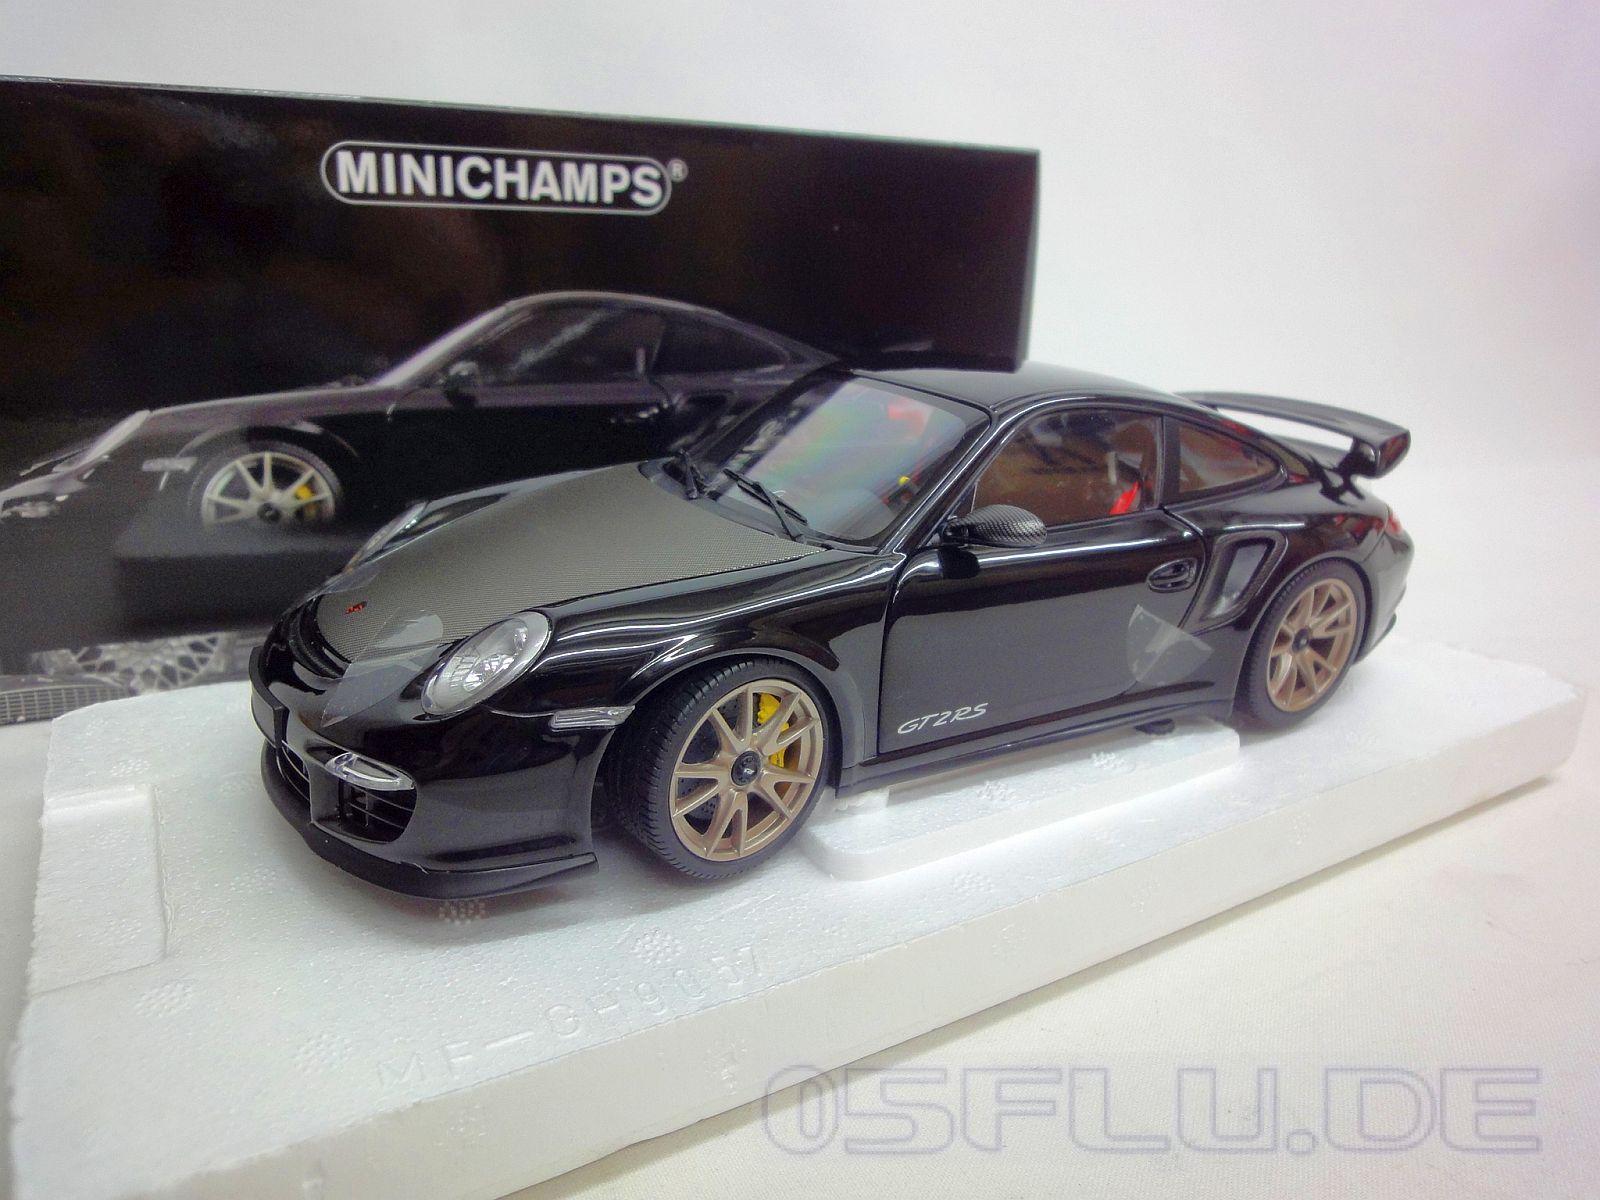 minichamps 1 18 porsche 911 997 ii gt2 rs 2011 black w silver wheels n. Black Bedroom Furniture Sets. Home Design Ideas